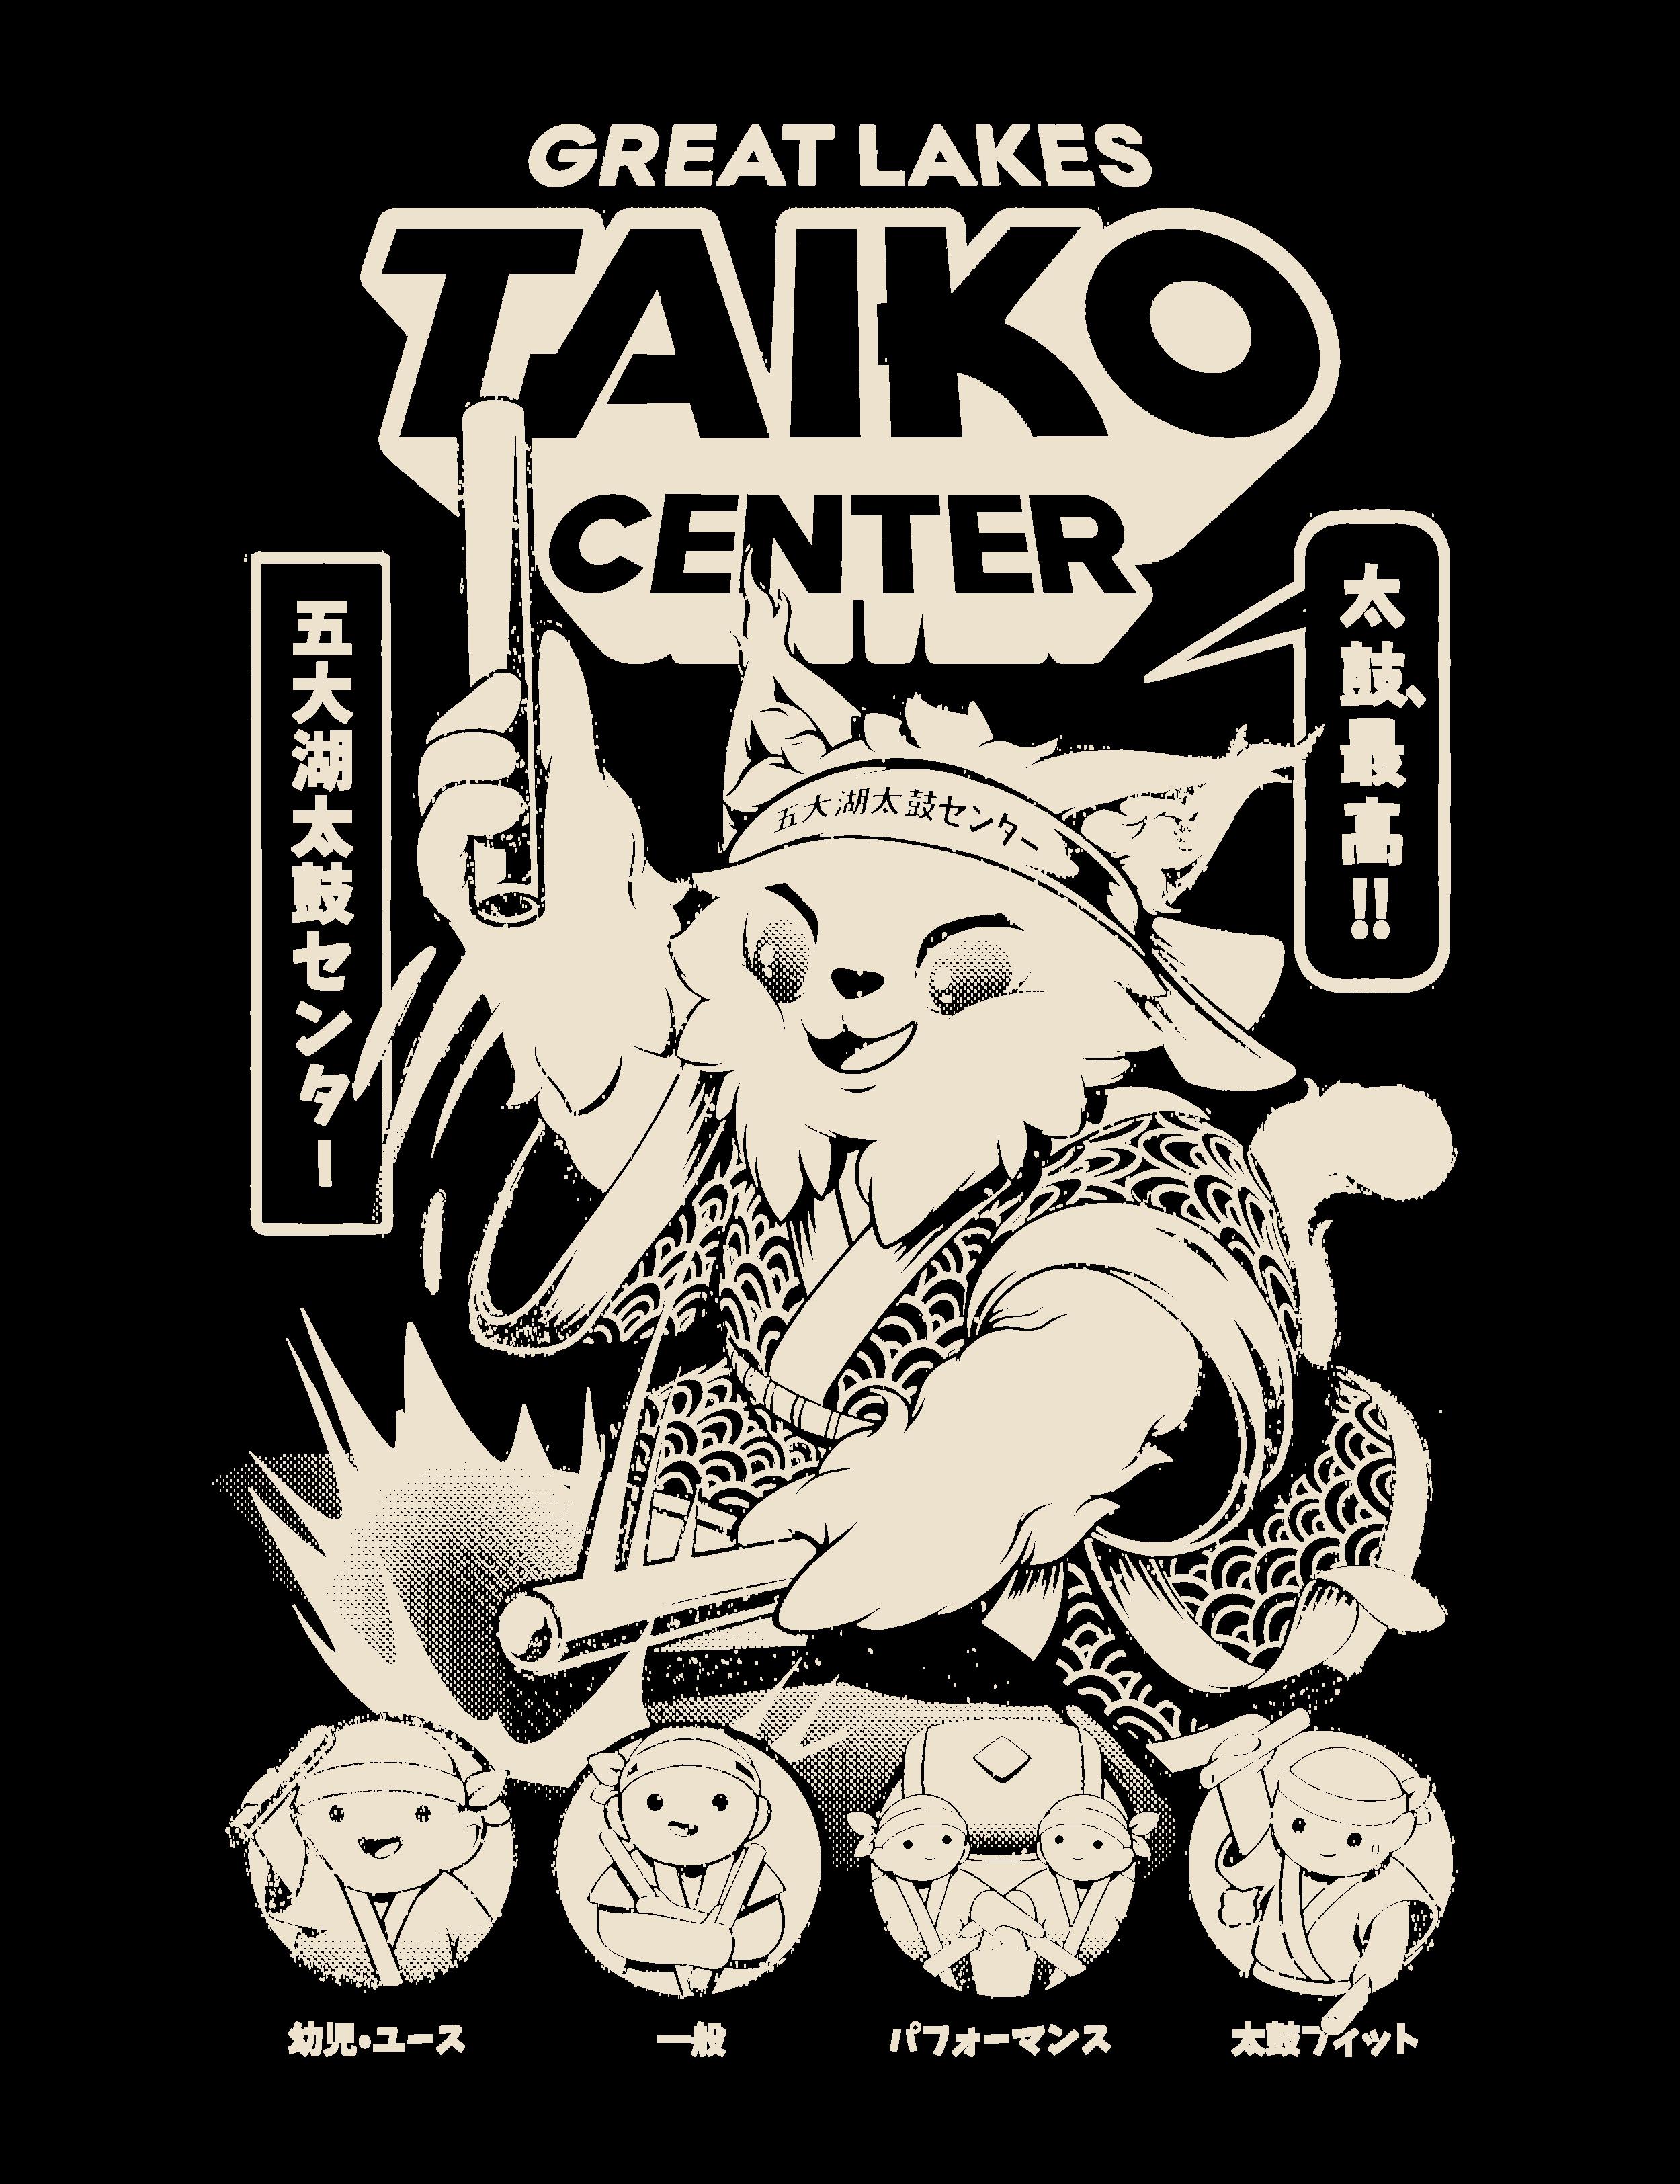 Taikocenter_finalartwork [dark version].png